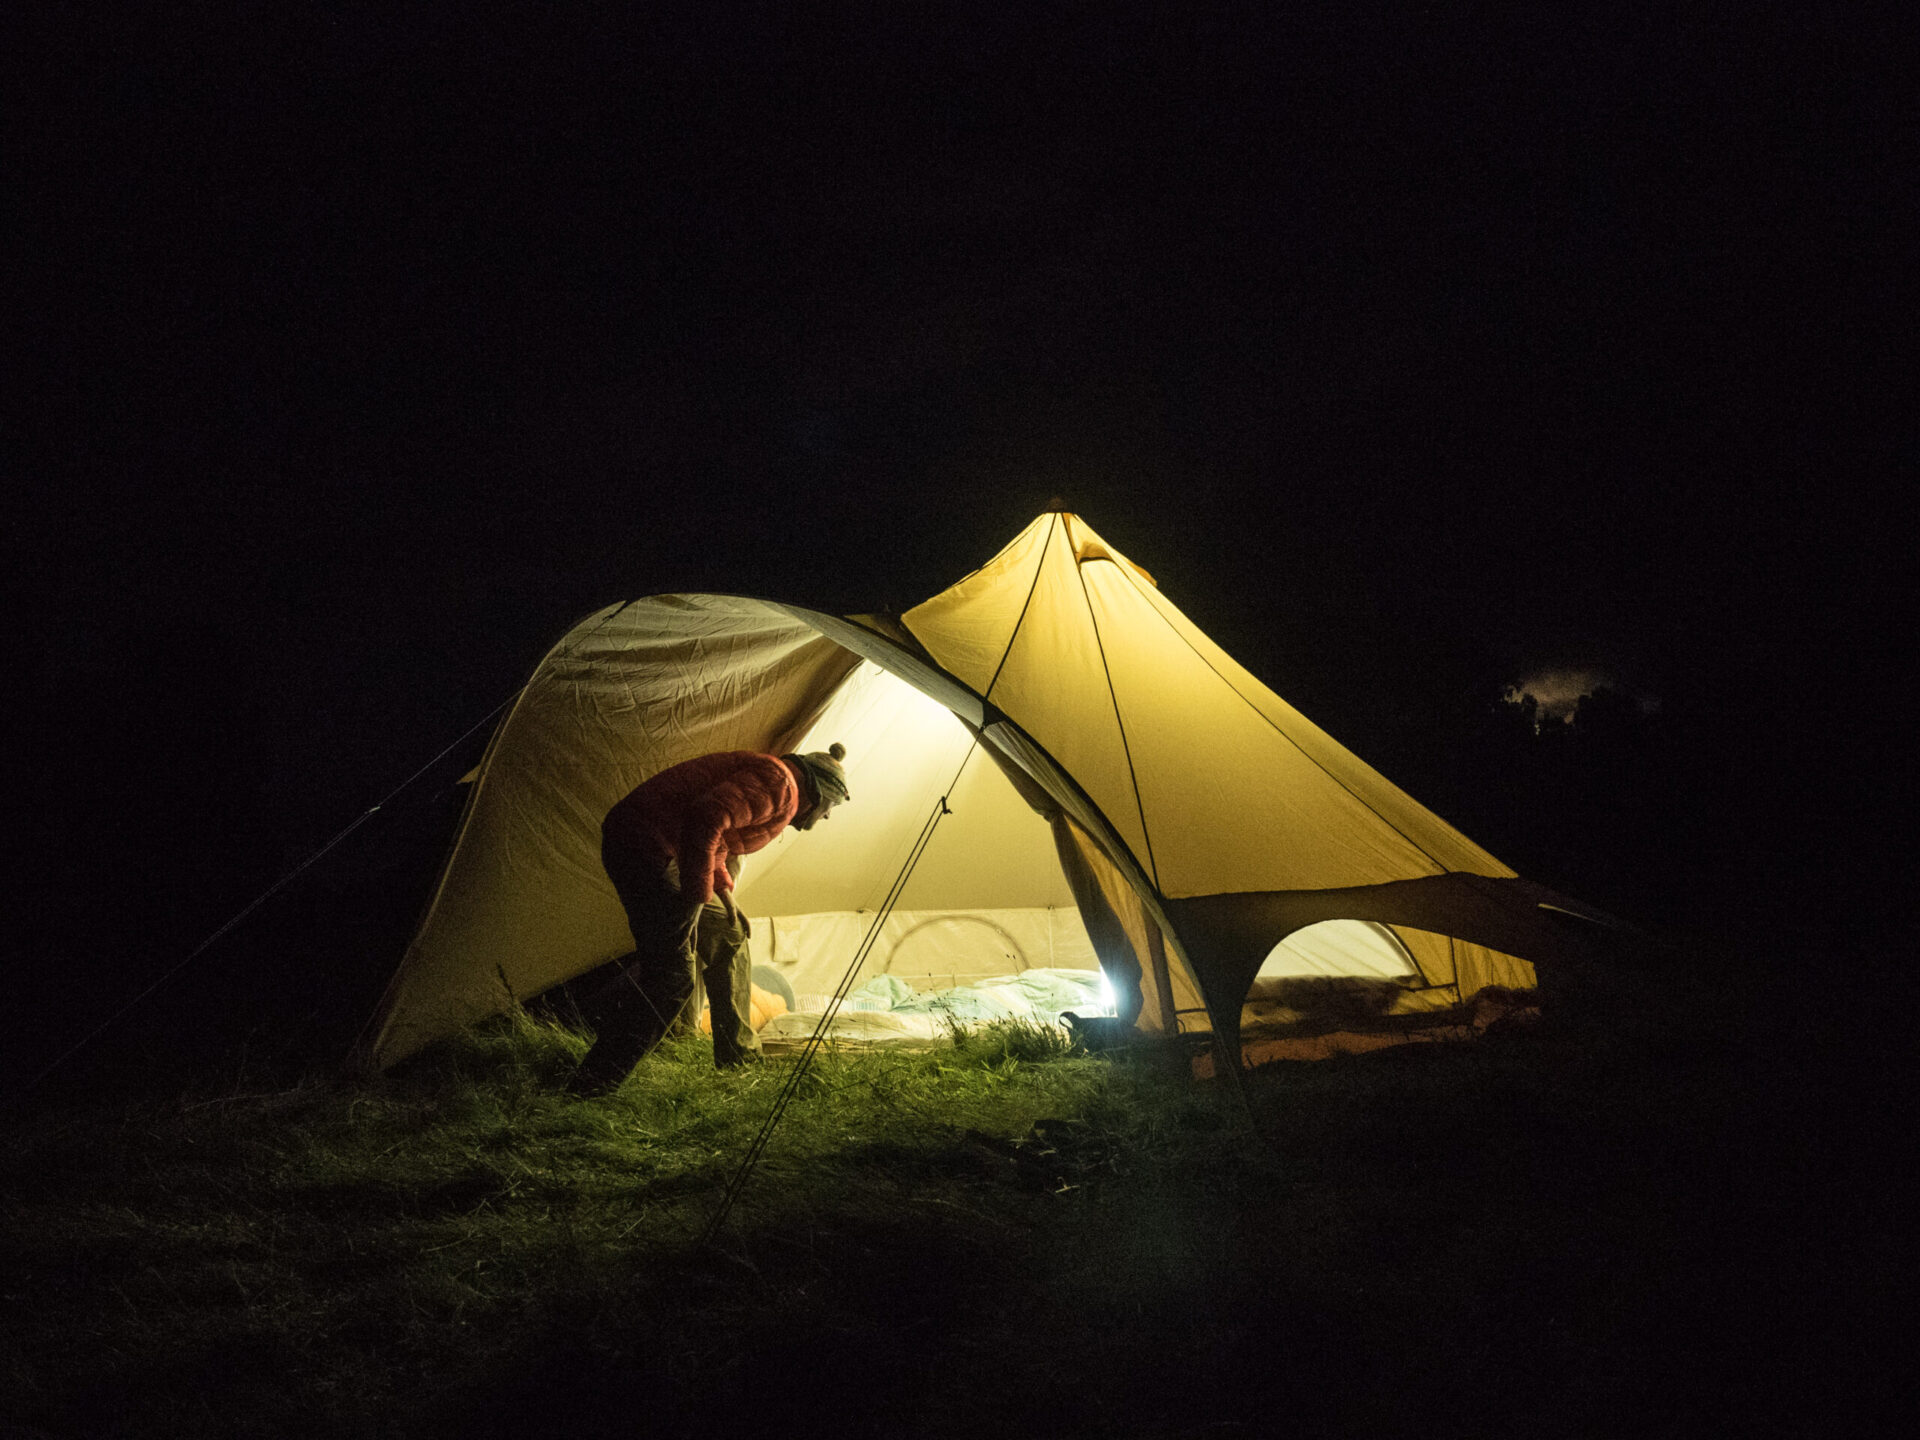 Backcountry basecamp